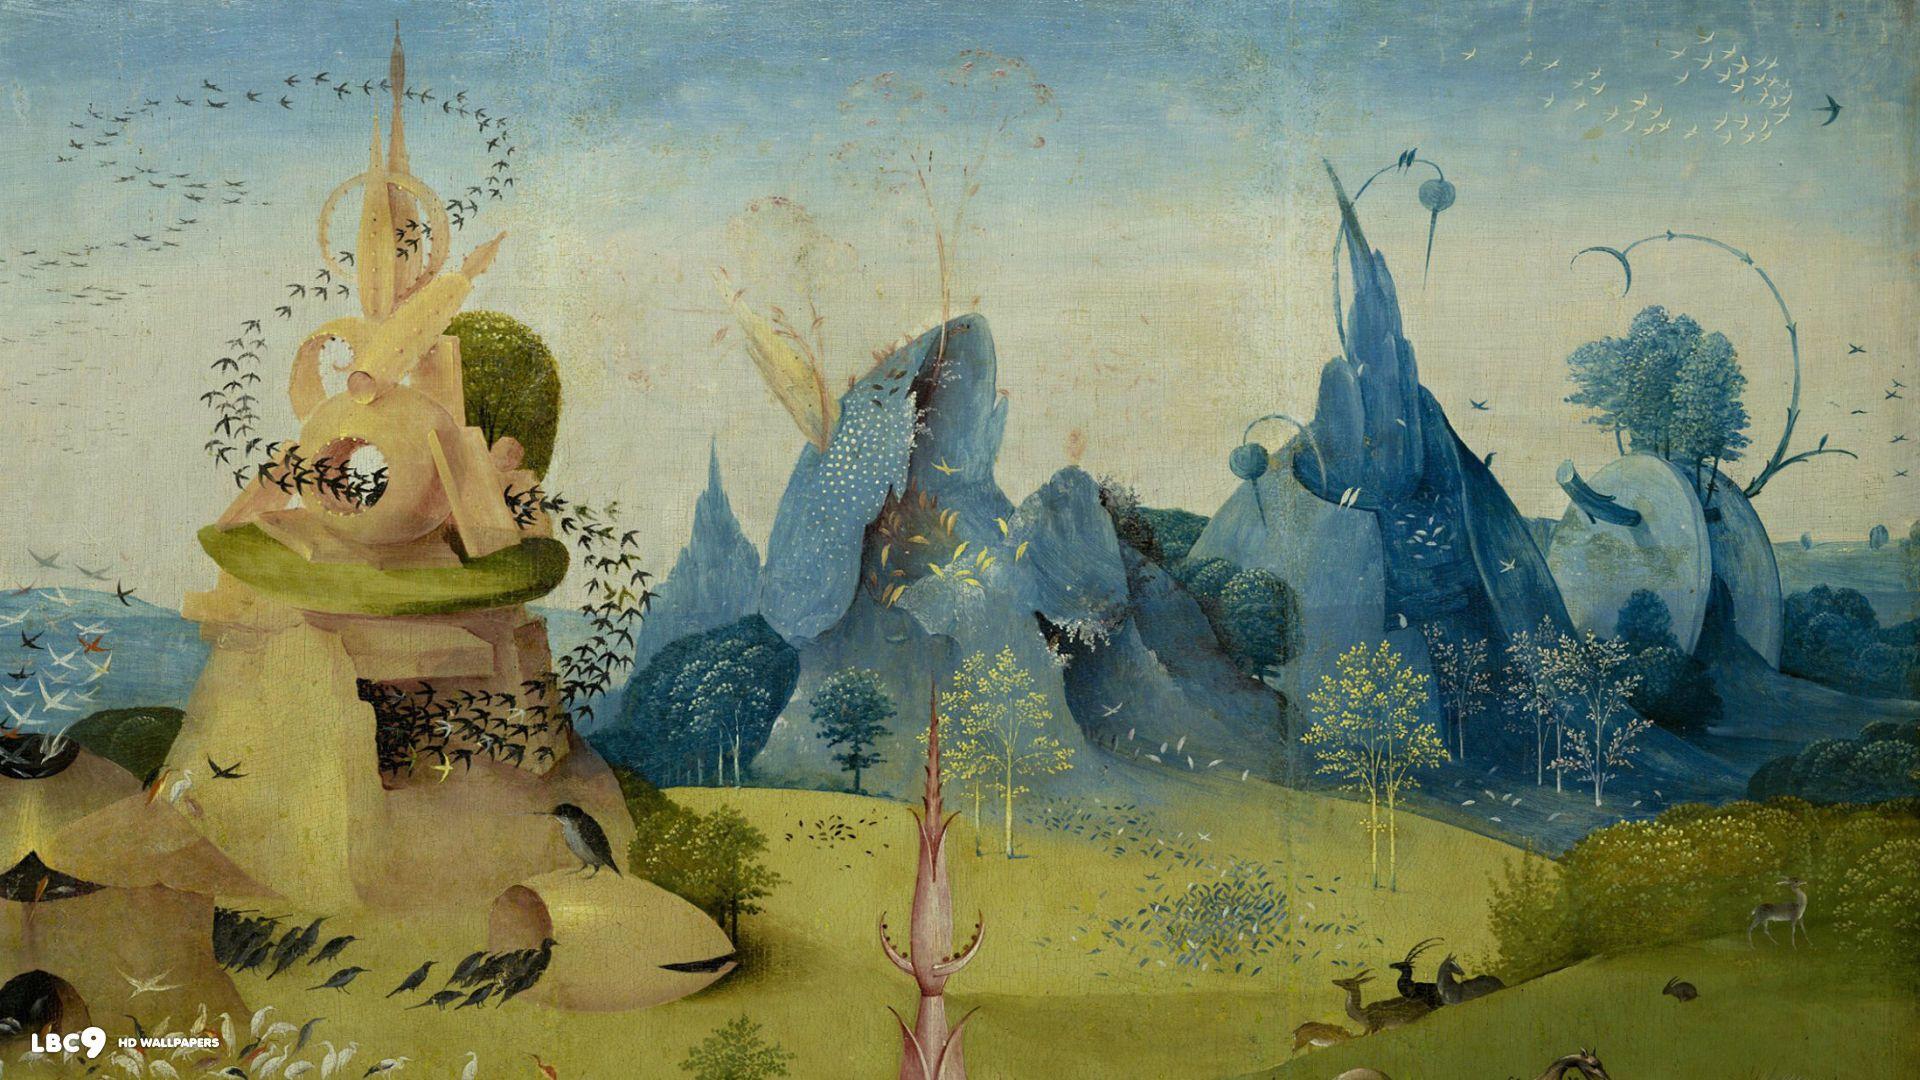 5e9efdf32fcee15dc3a6f6e63a748d95 Jpg 1920 1080 Hieronymus Bosch Painting Art